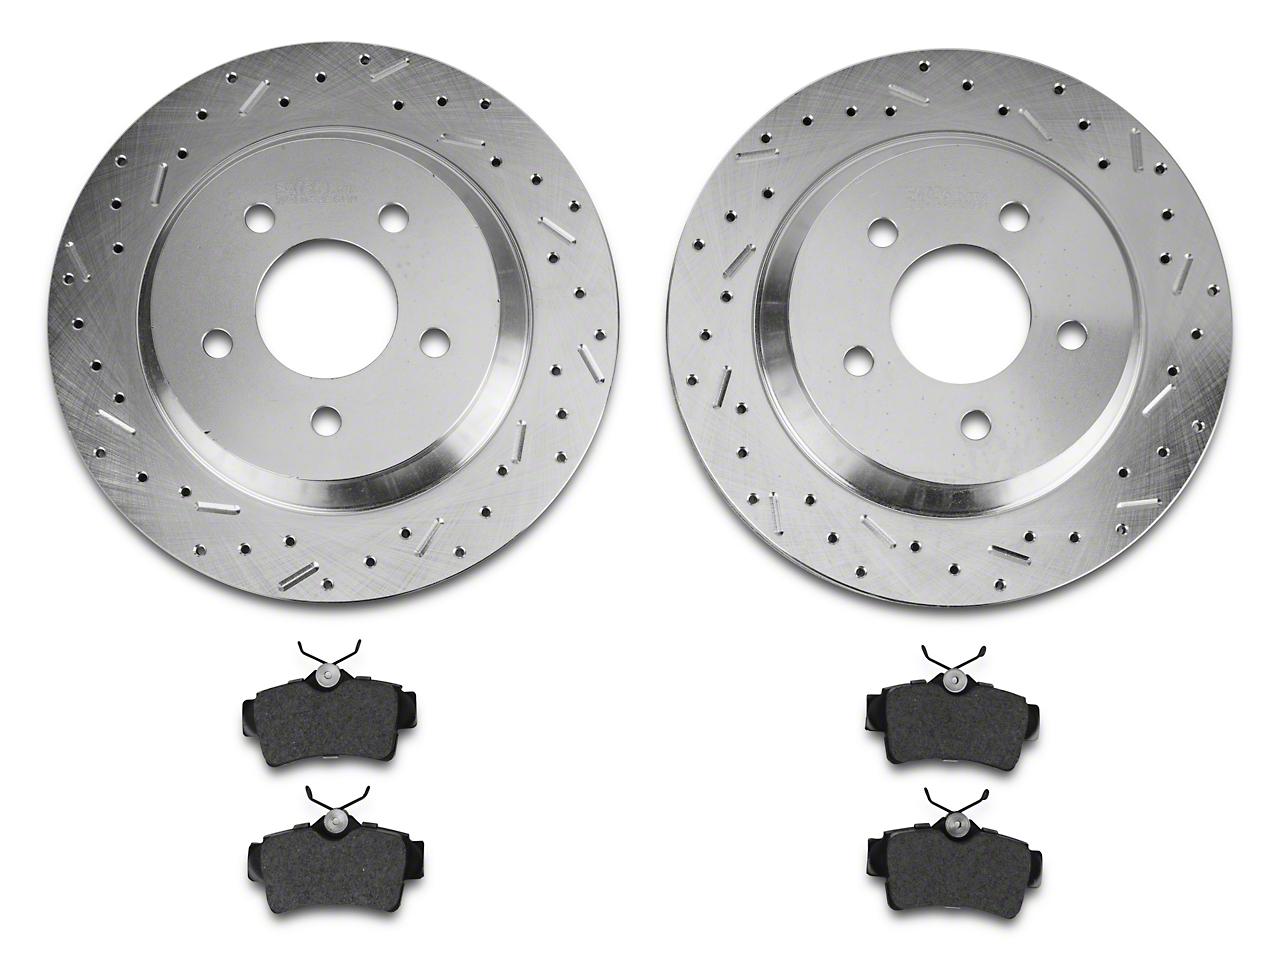 Xtreme Stop Precision Cross-Drilled & Slotted Rotors w/ Ceramic Brake Pad Kit - Rear (94-04 Bullitt, Mach 1, Cobra)